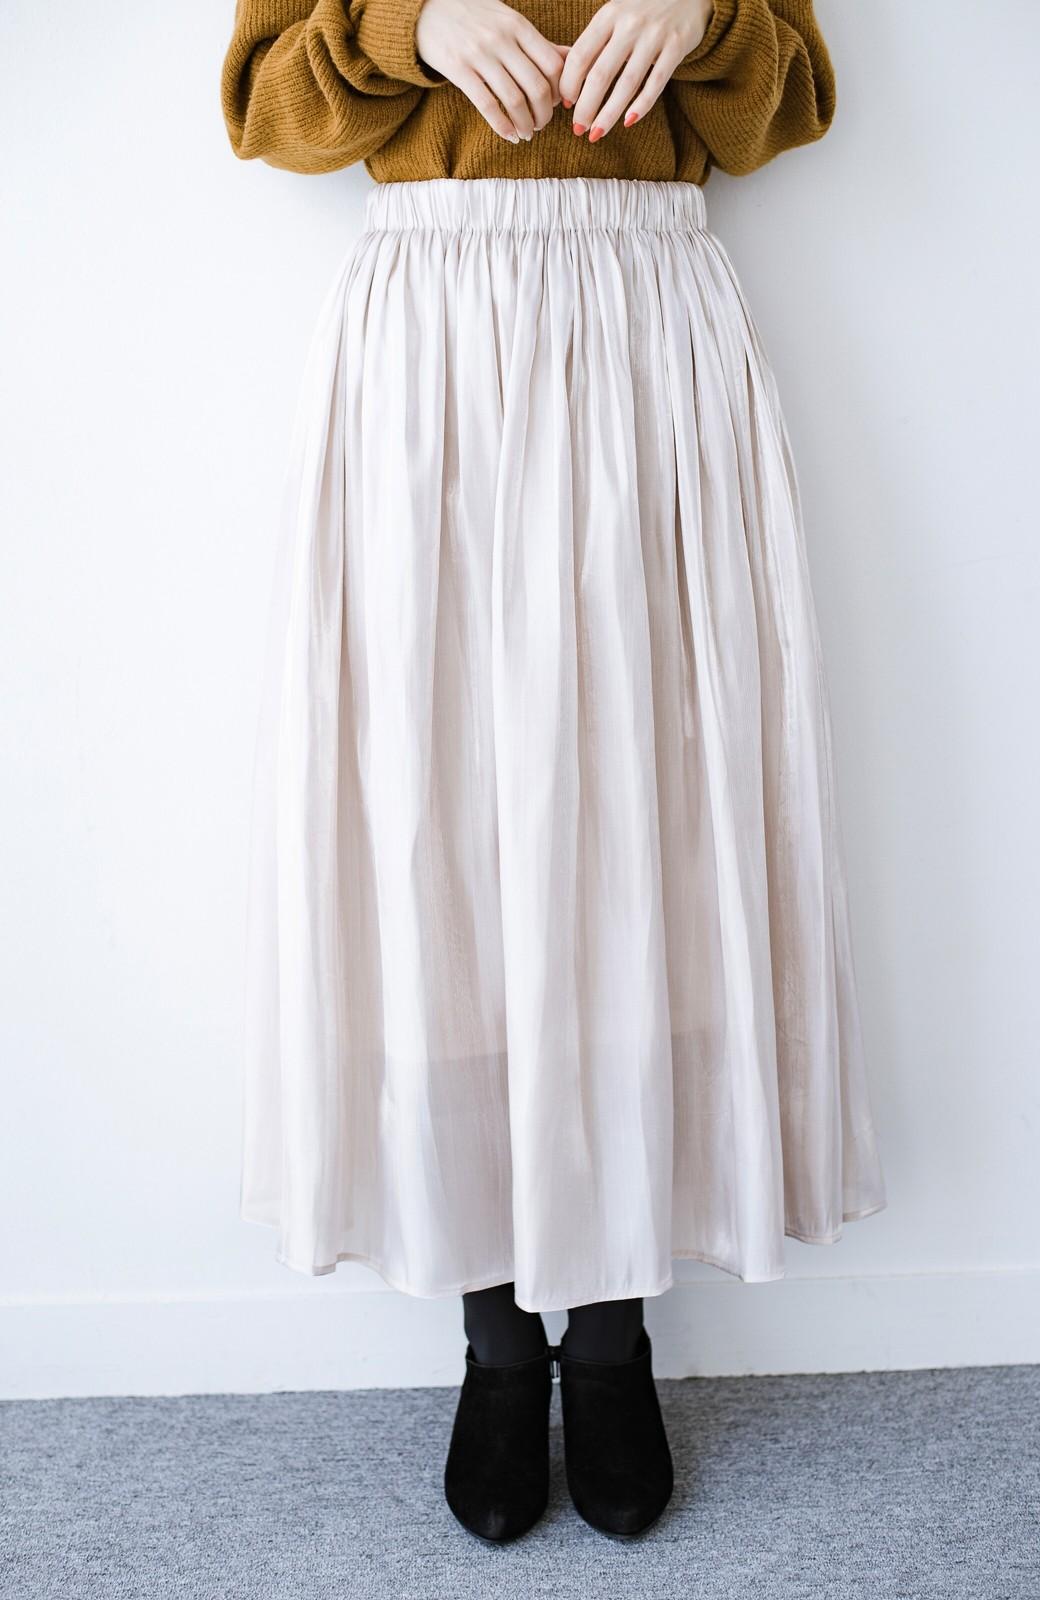 haco! 【人気のため新色追加!】1枚でも重ね着にも便利なキラキラ素材がかわいいロングスカート by laulea <アイボリー>の商品写真5